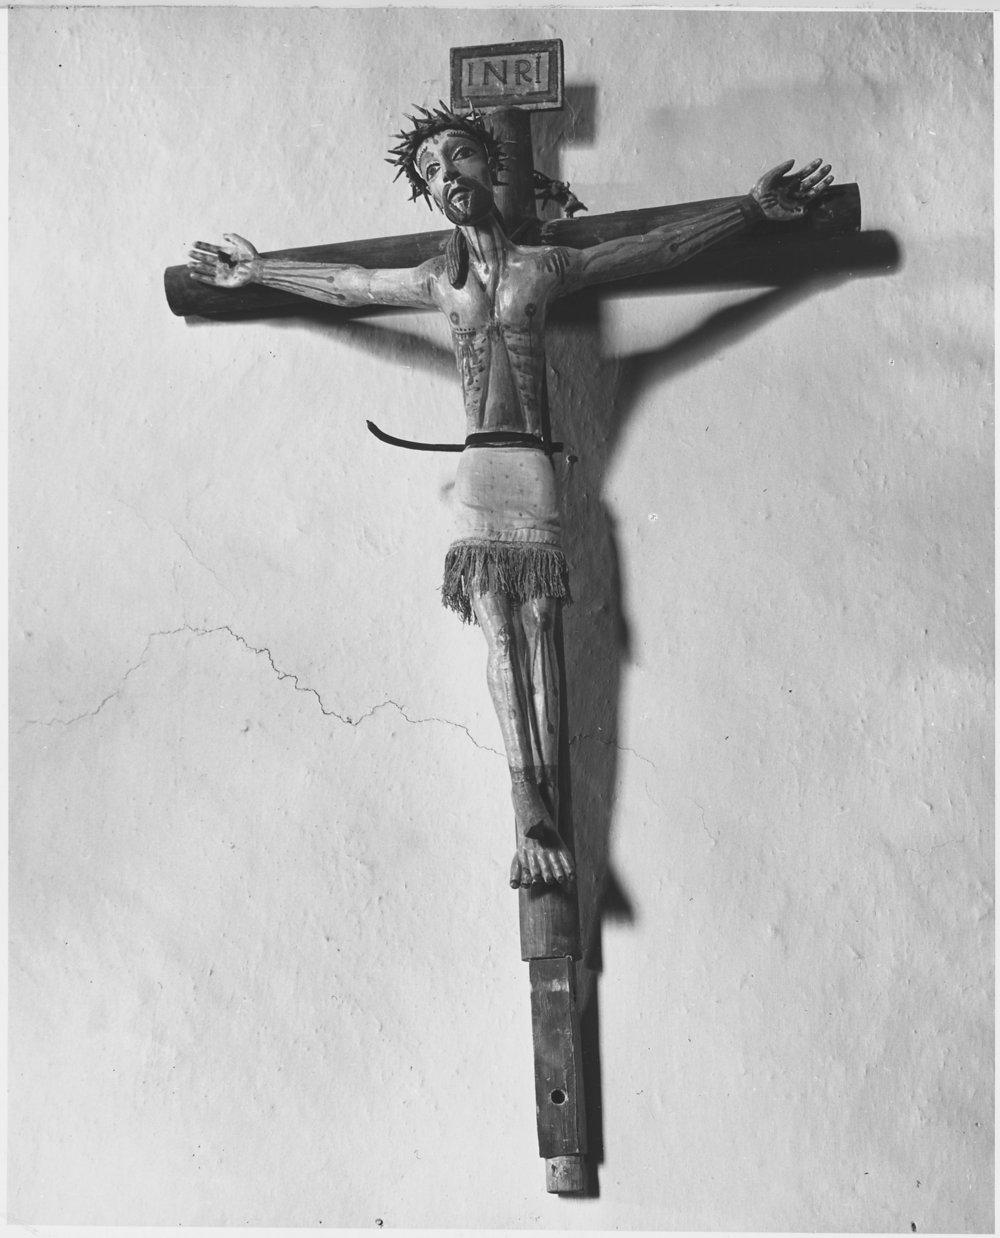 Taos_County,_New_Mexico._Christo_at_Arroyo_Seco_church_-_NARA_-_521928.jpg